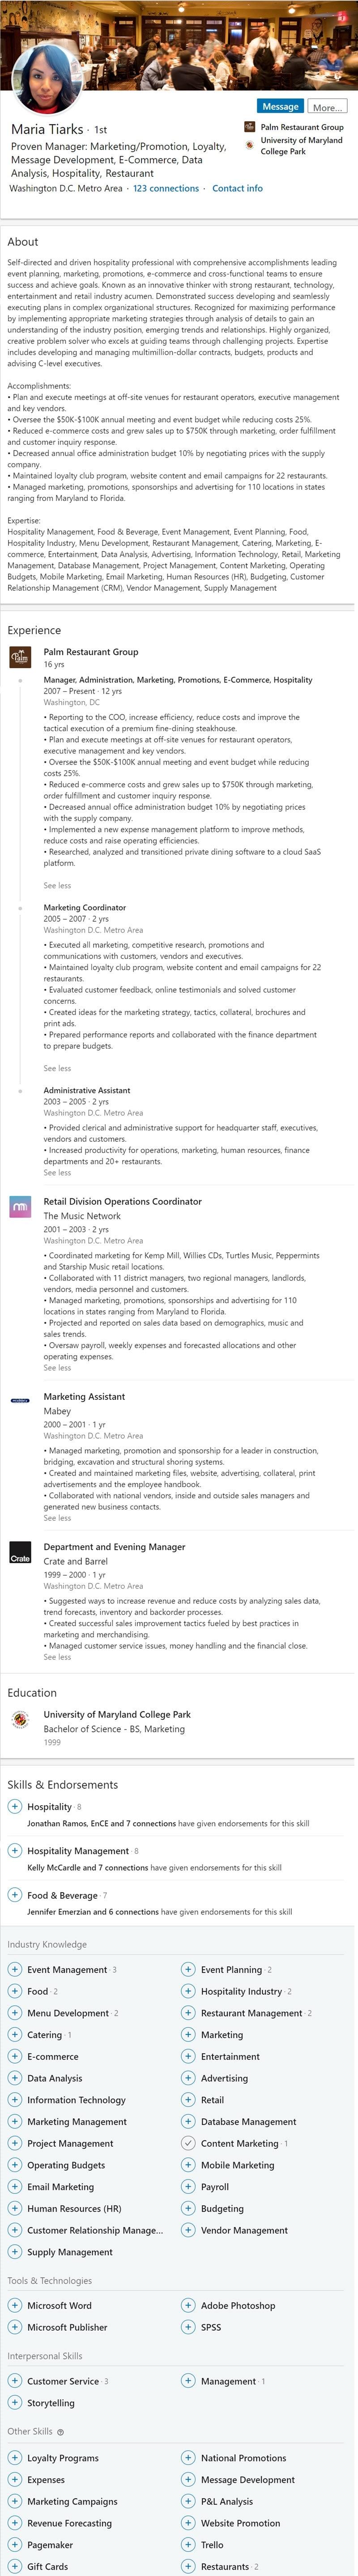 Linkedin profile example restaurant food beverage 2558